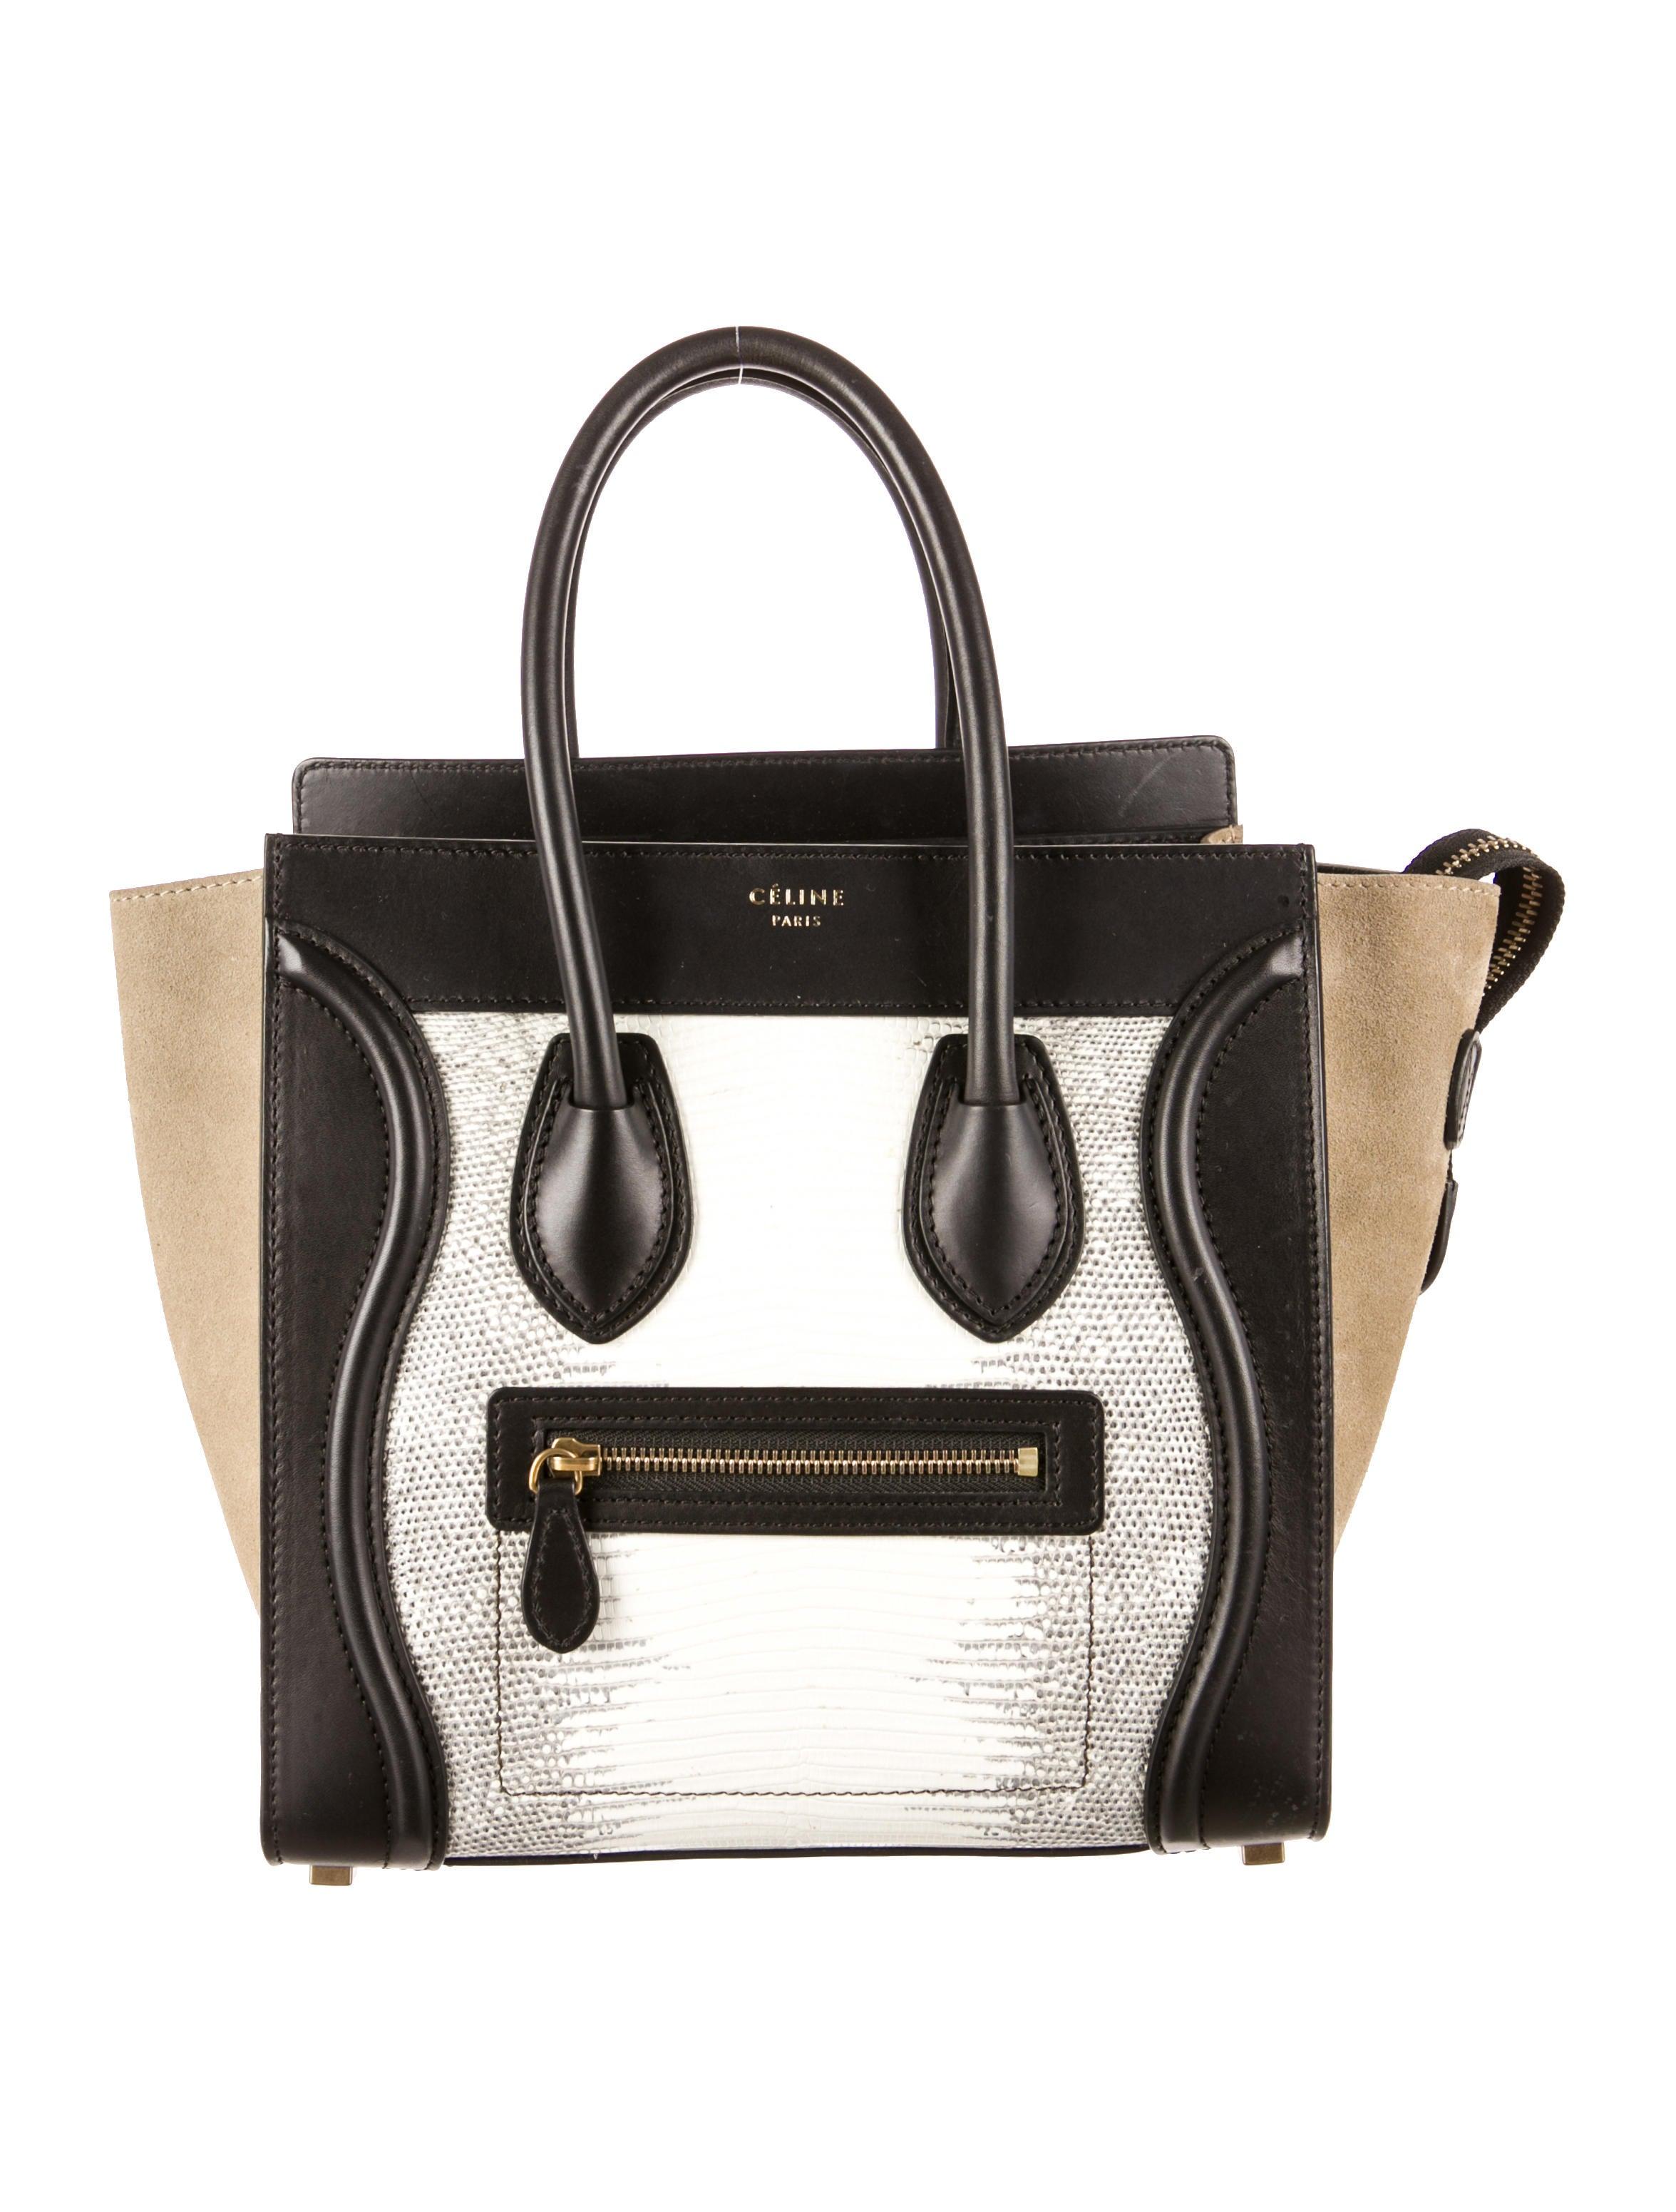 celine luggage bag buy online - celine lizard handbag, celine nano luggage tote replica